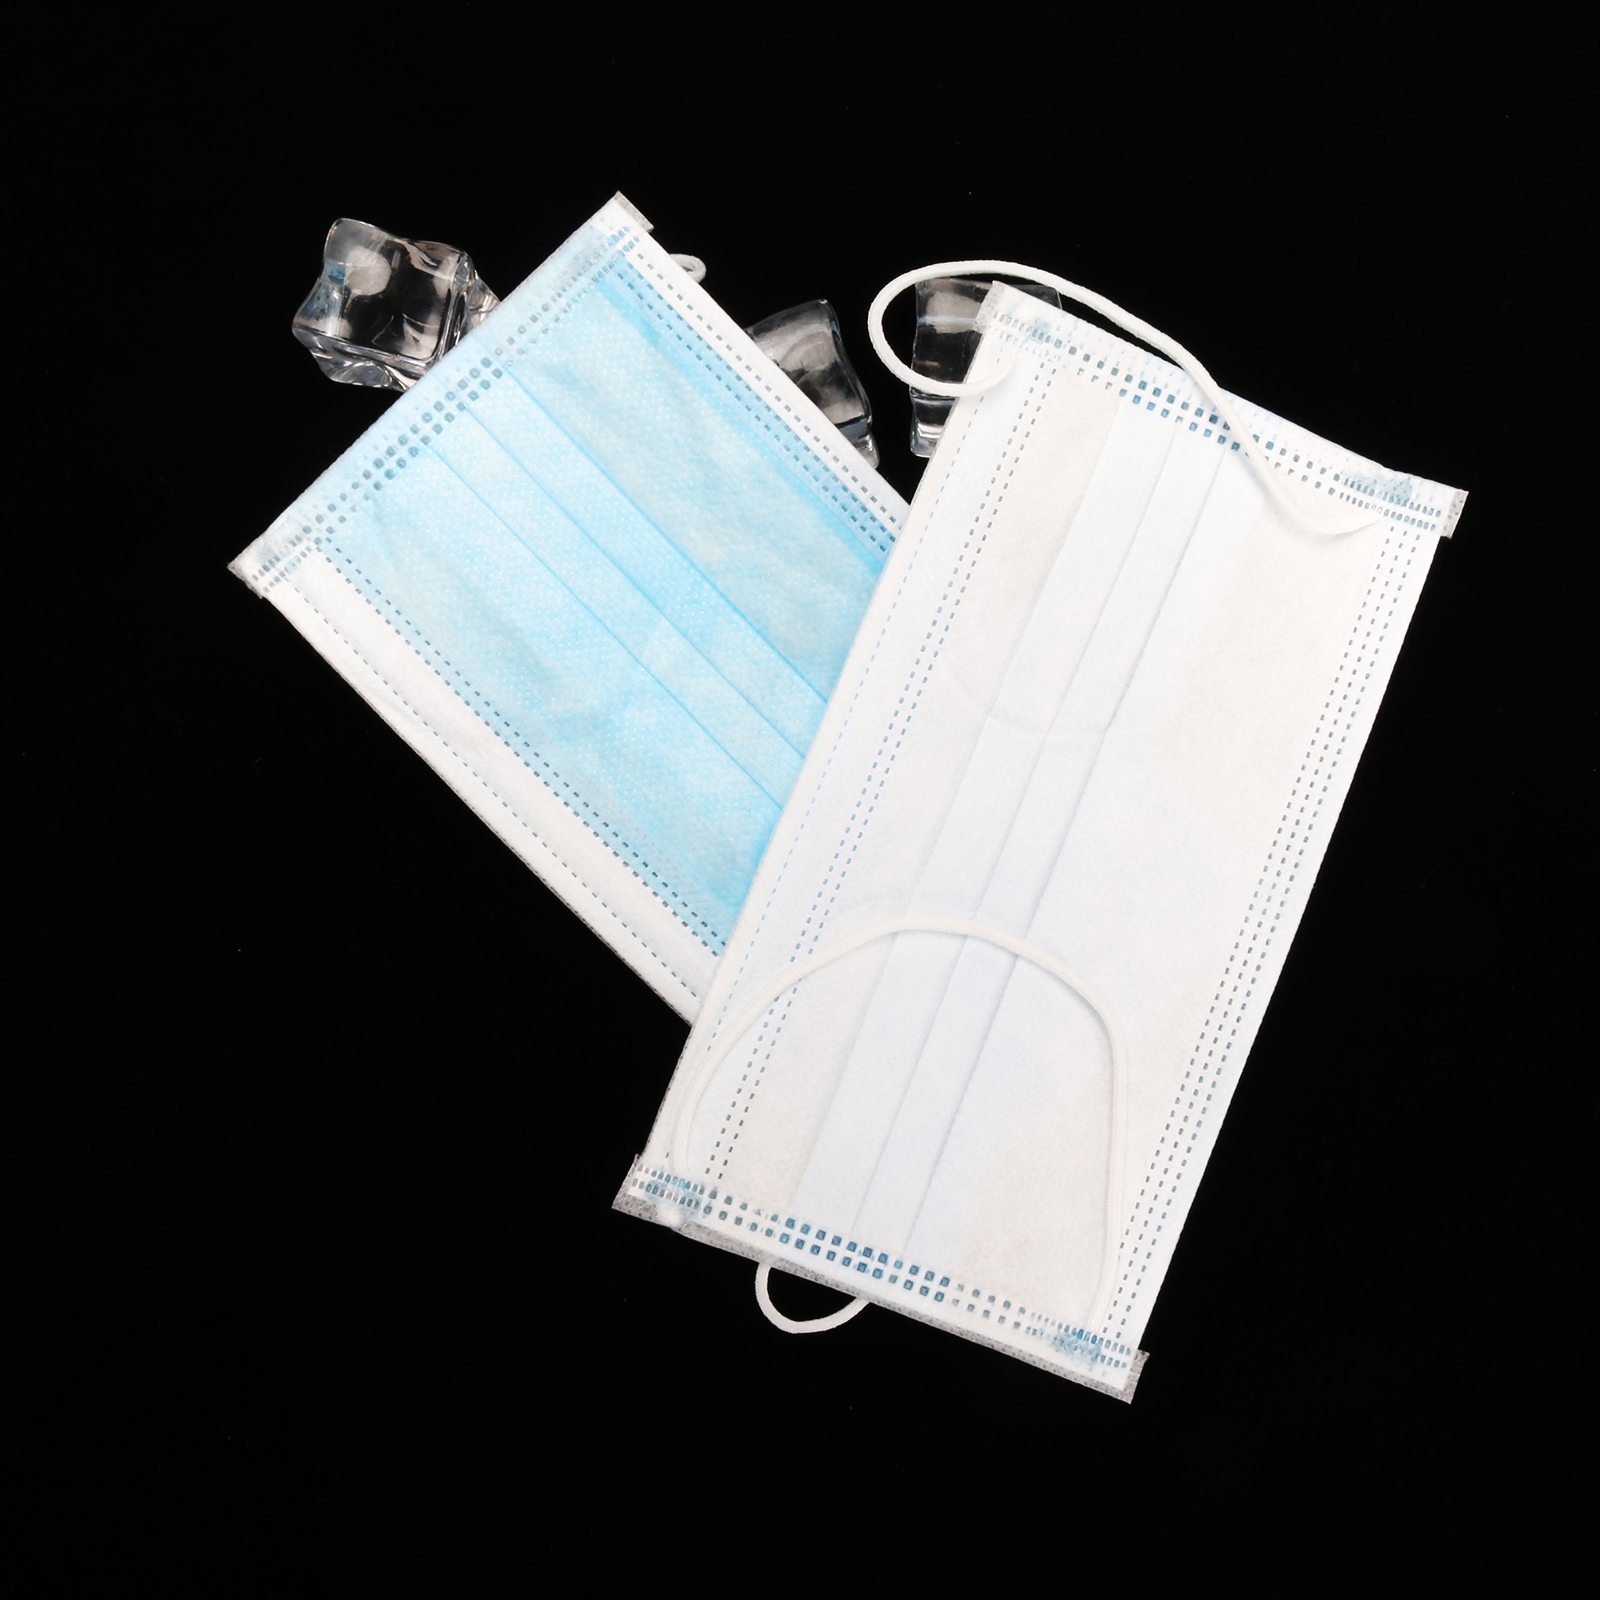 Image 5 - 5/10/20/50/100pcs/Set Dental Disposable Ear loop Face  Hypoallergenic Dust proof Masks Anti dust Safe Breathable Mouth Mask  Masks